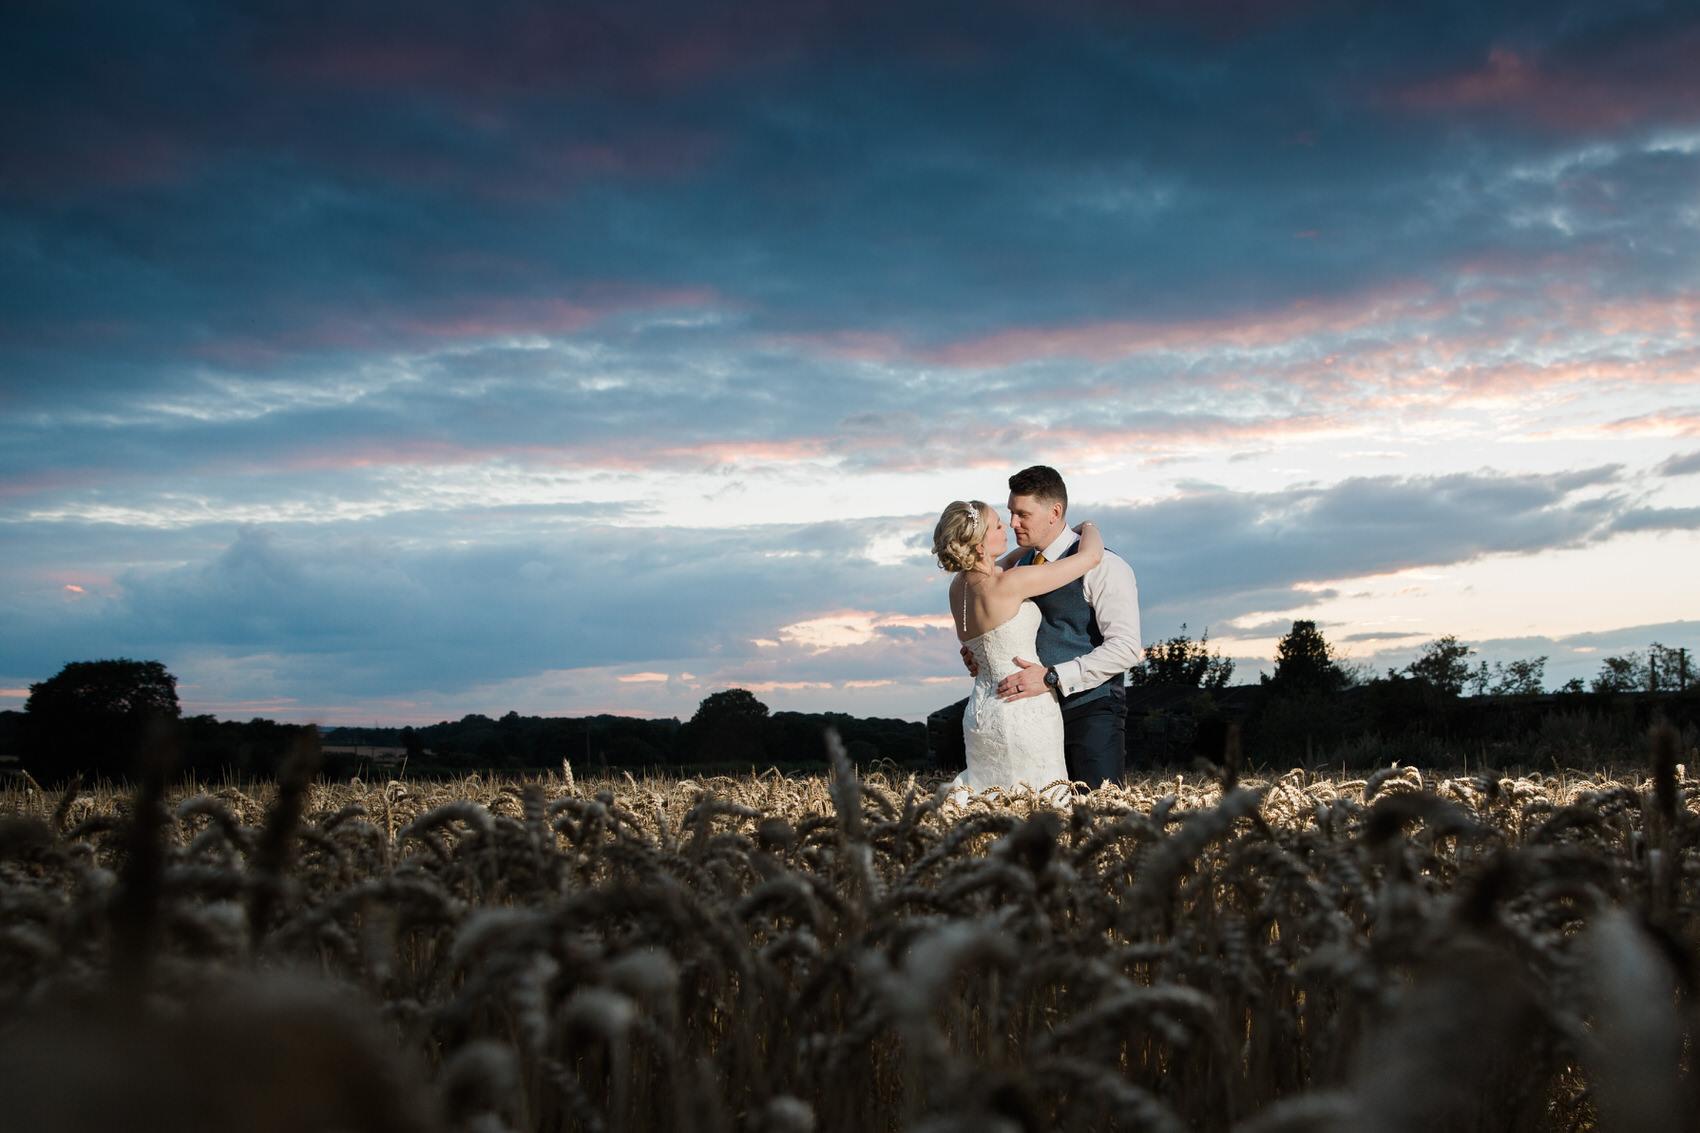 bride and groom at sunset cornfield uk wedding